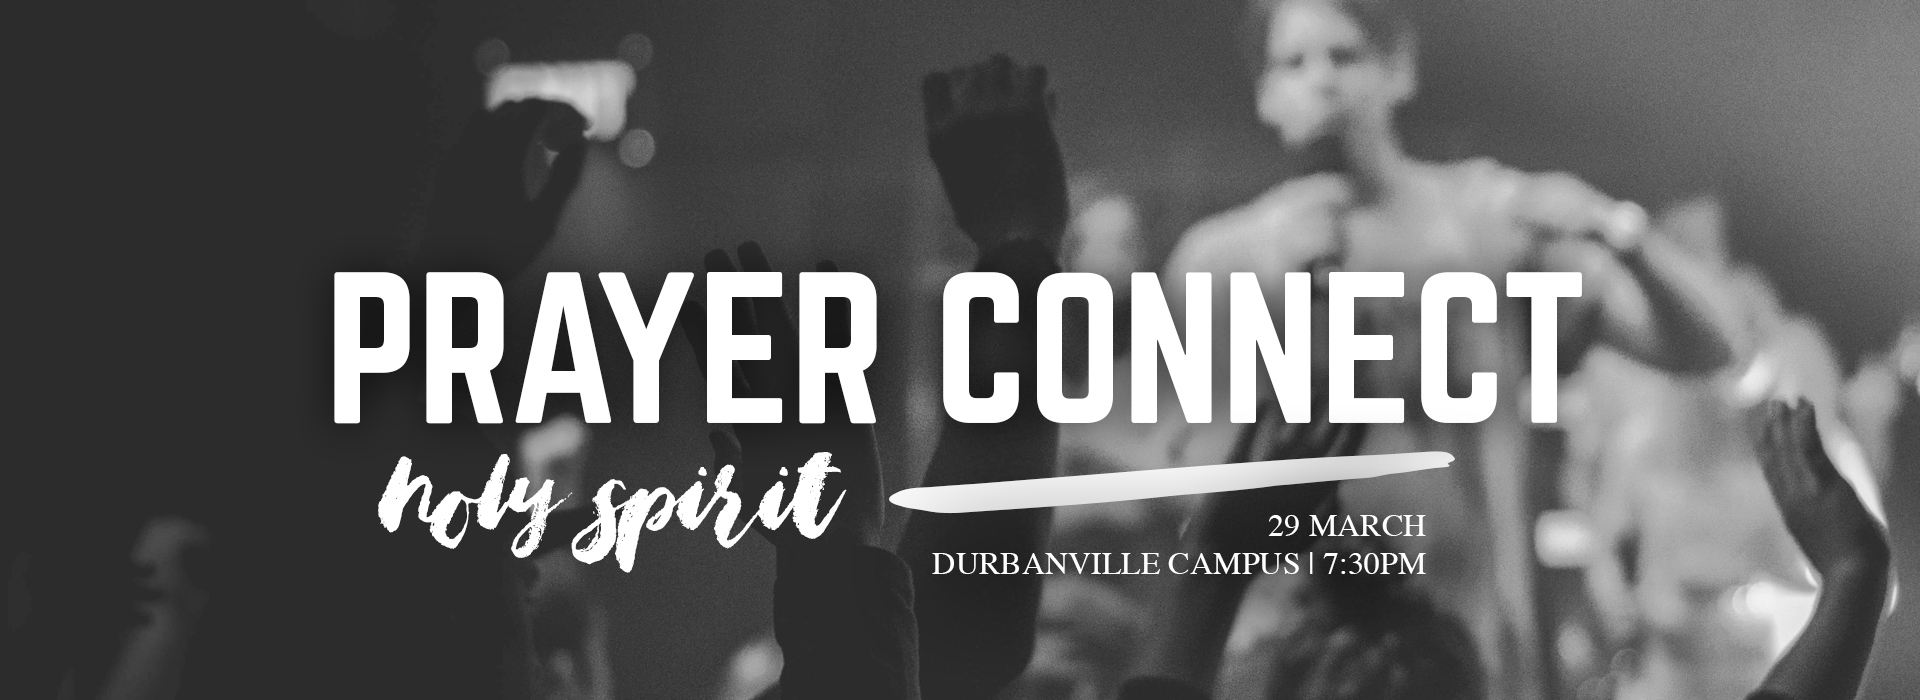 PrayerConnect_29Mar_WebBanner